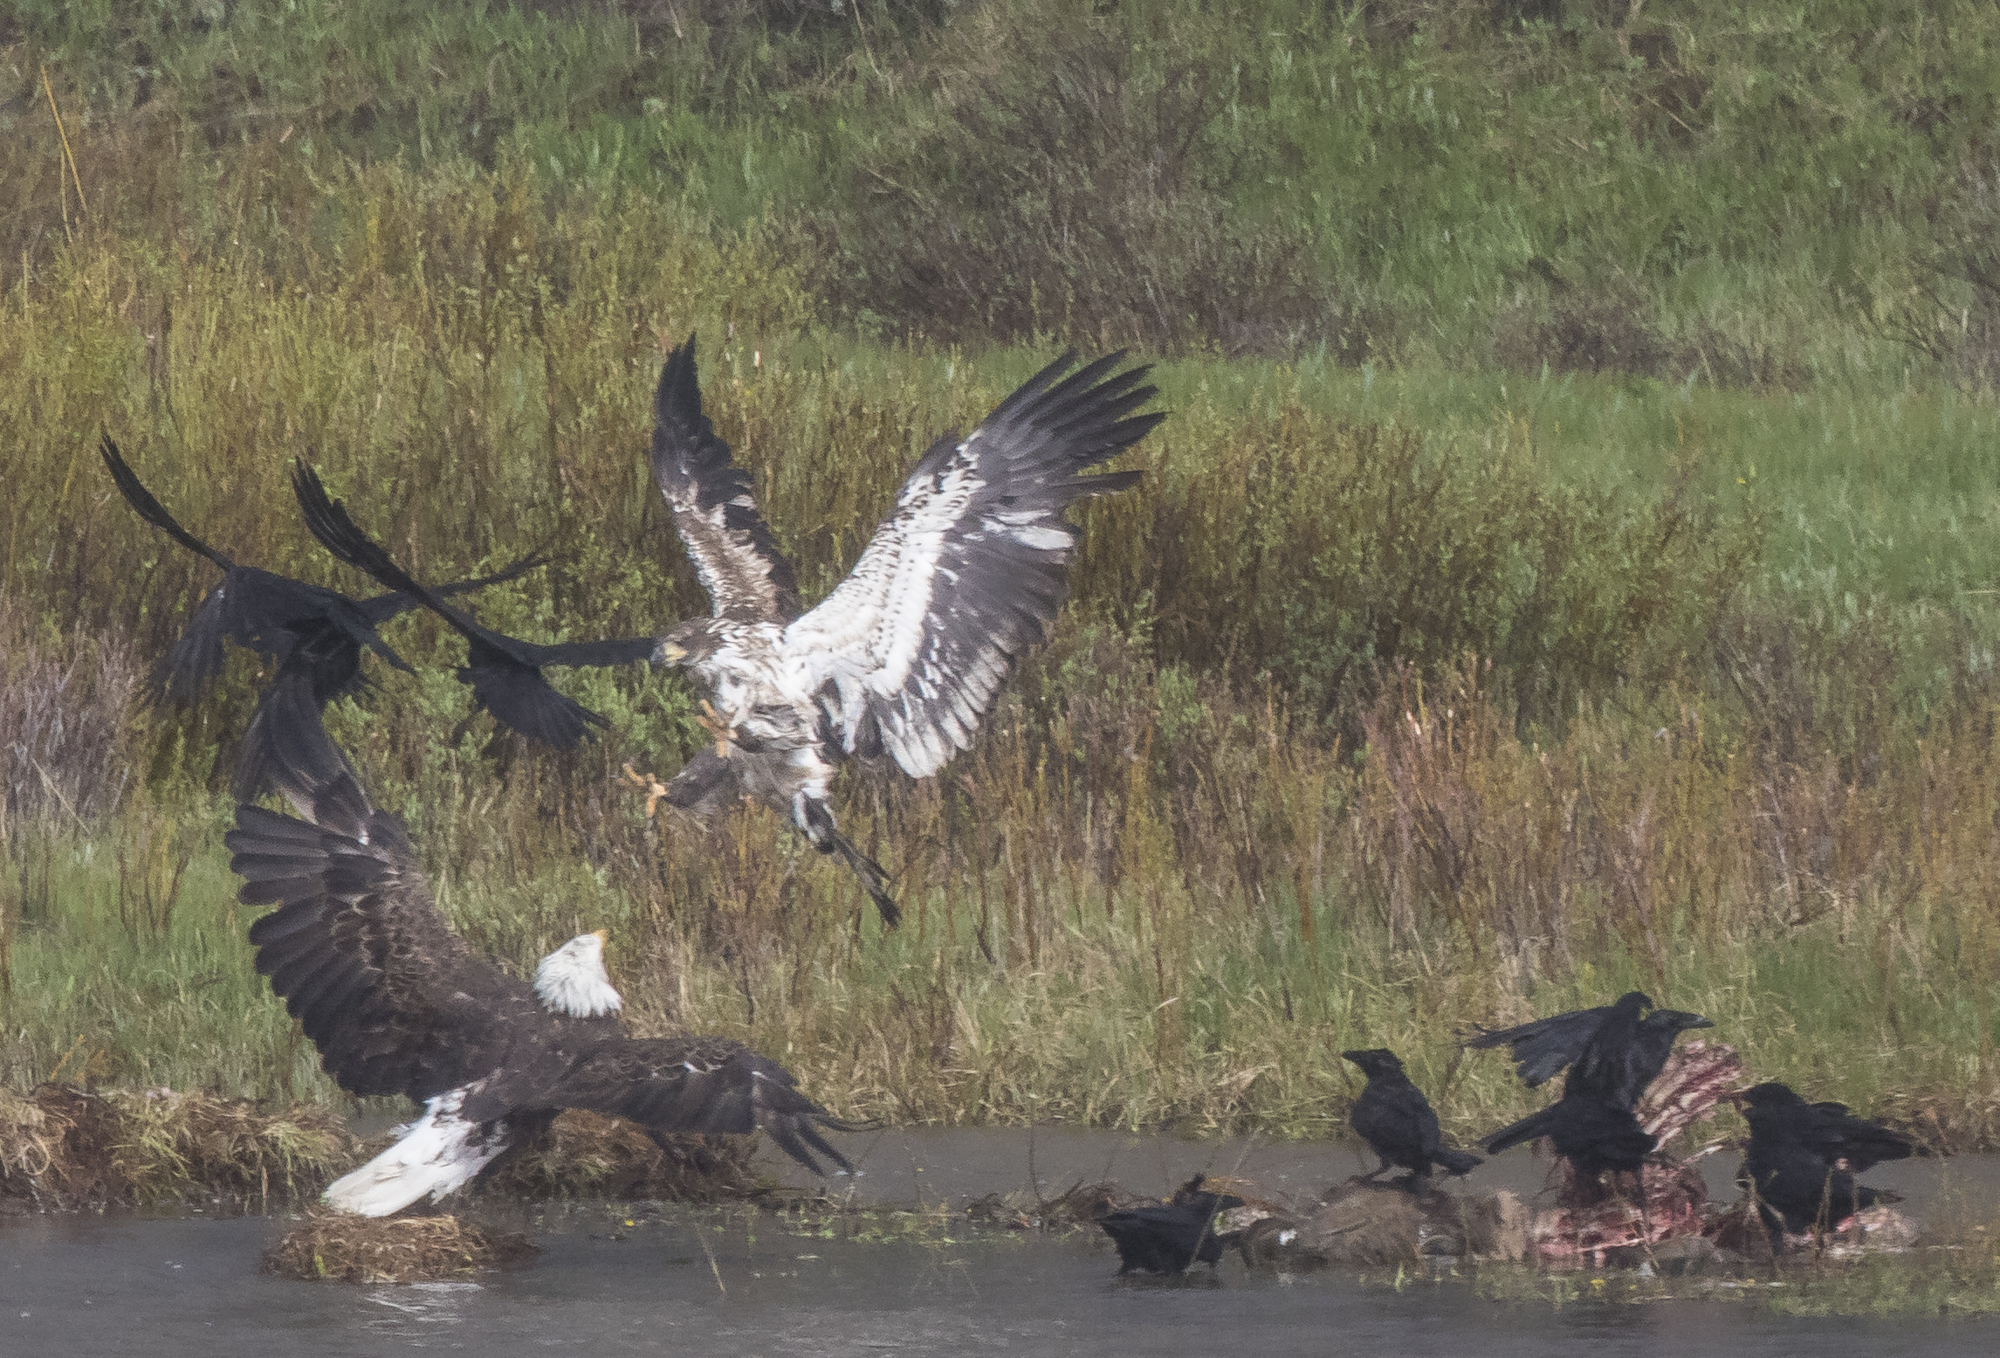 elk carcass and birds